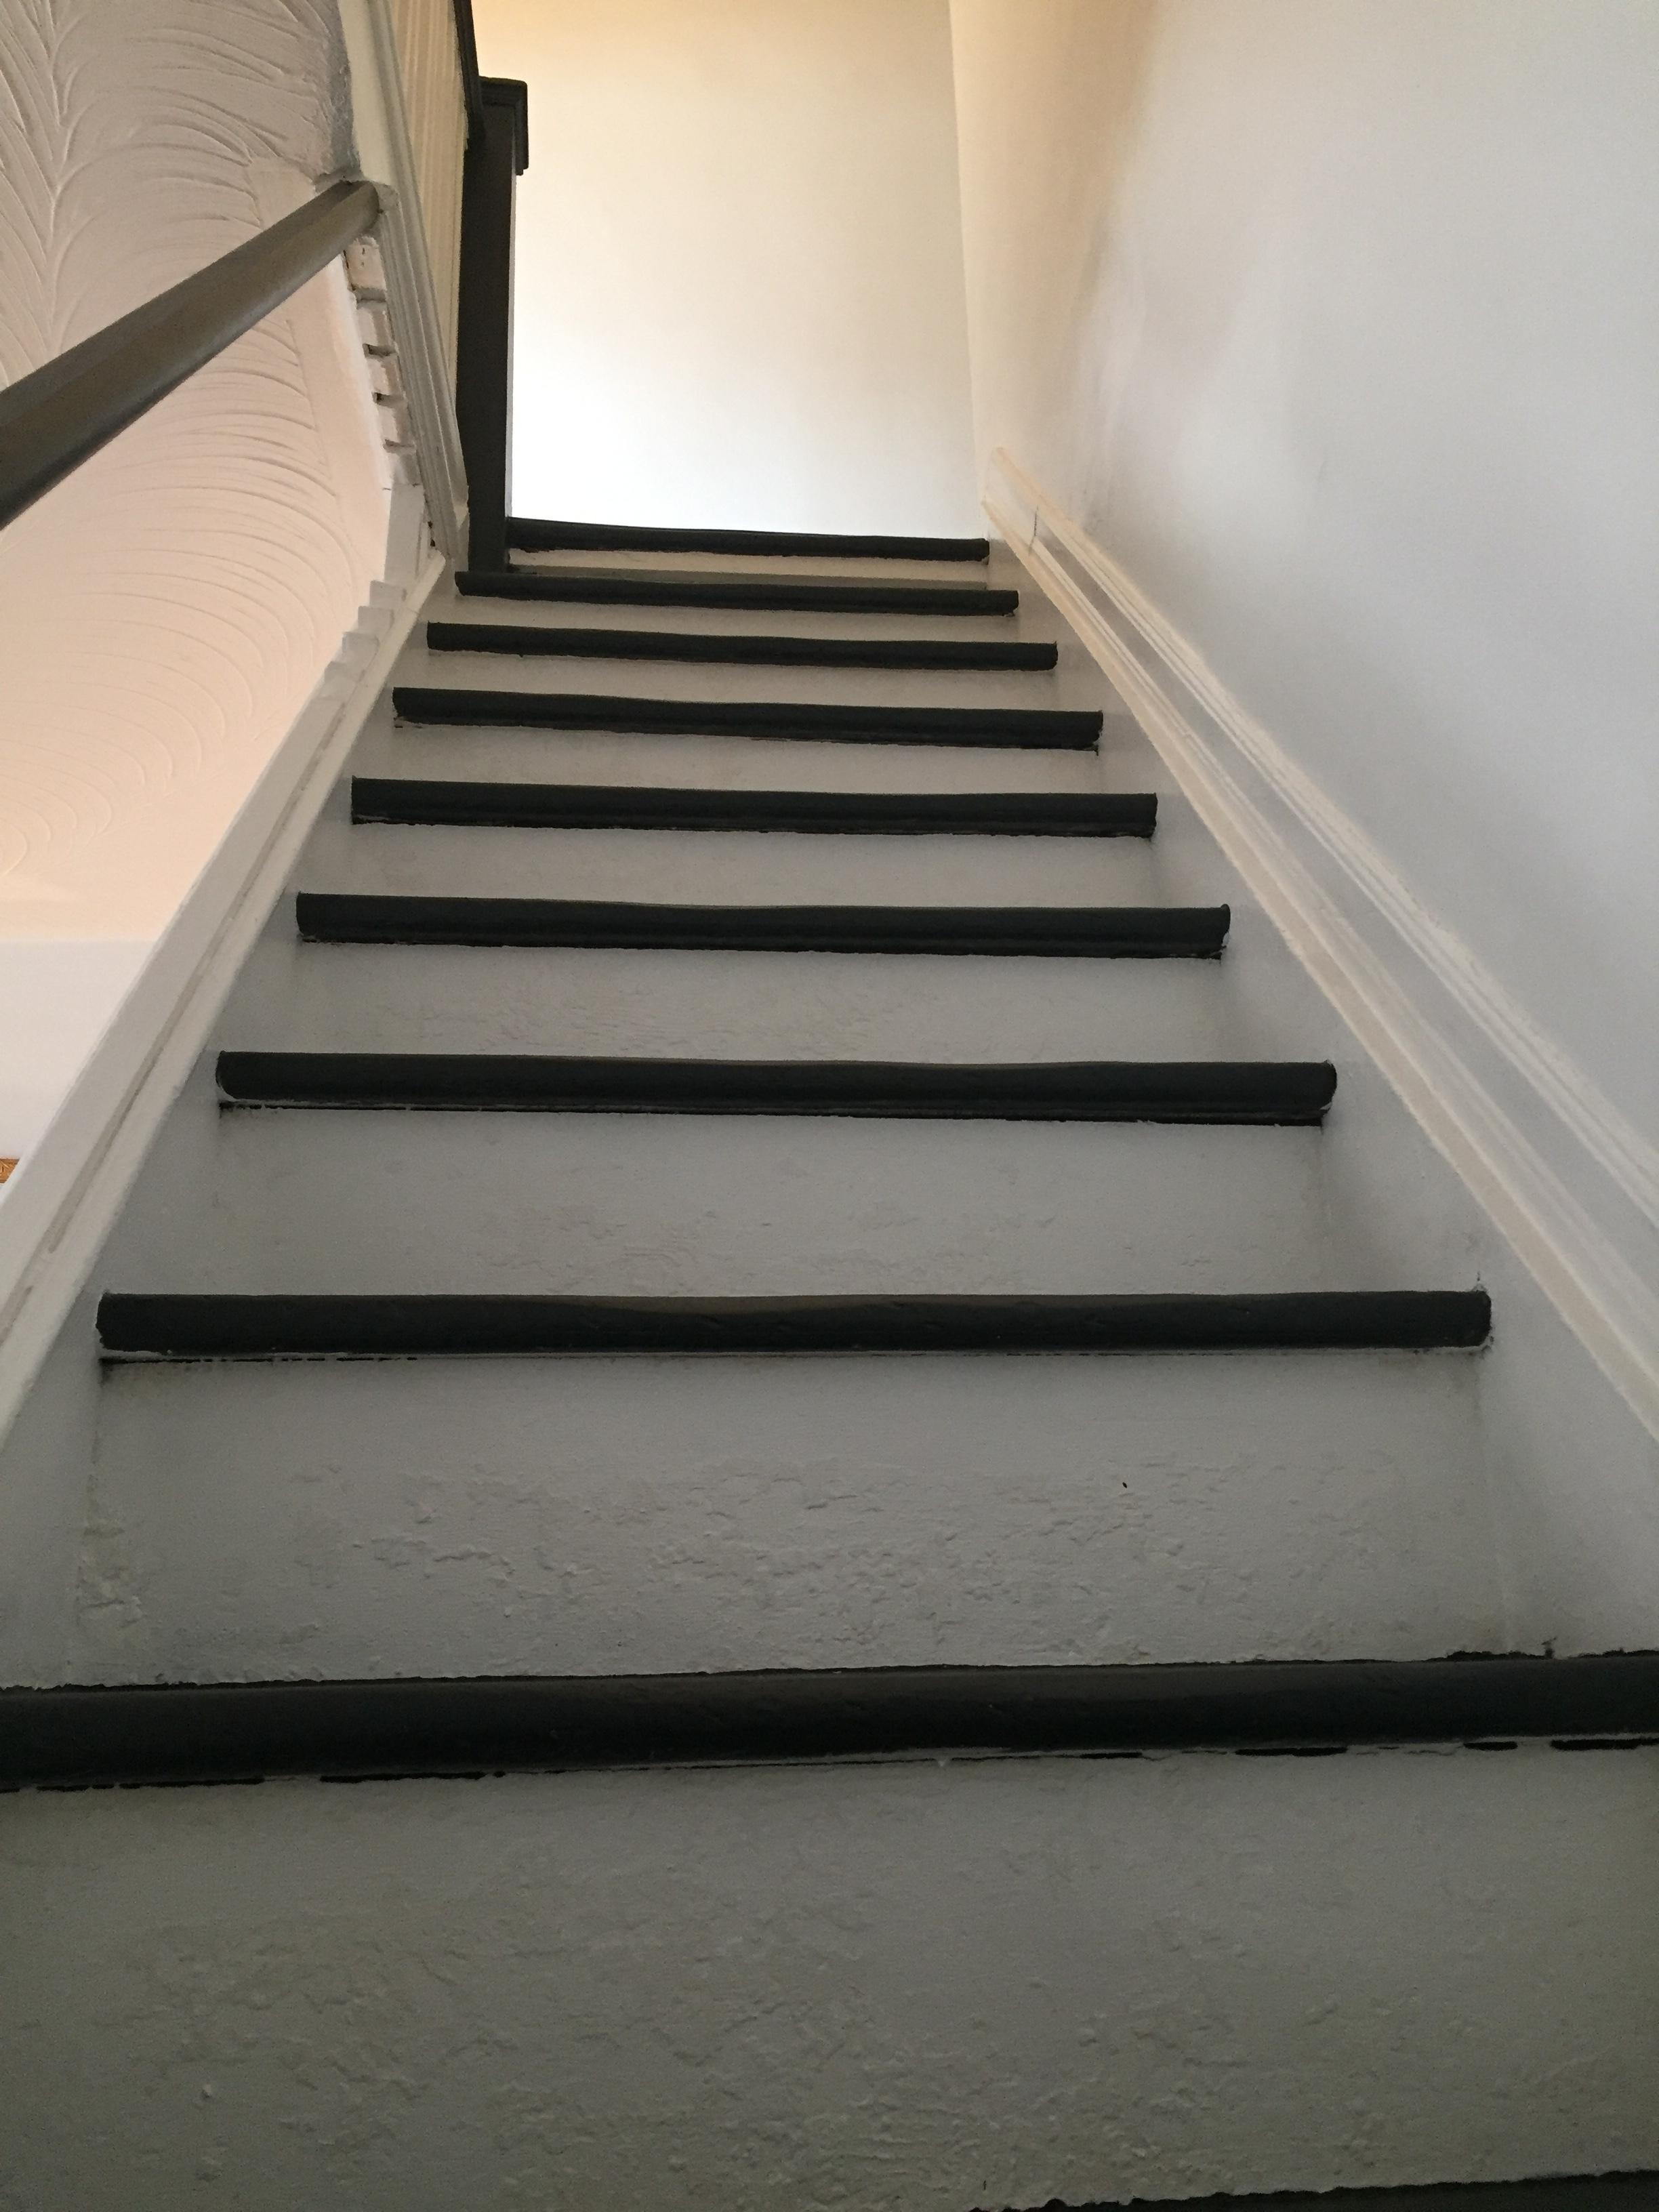 lesley-metcalfe-stairs-after-painted.JPG